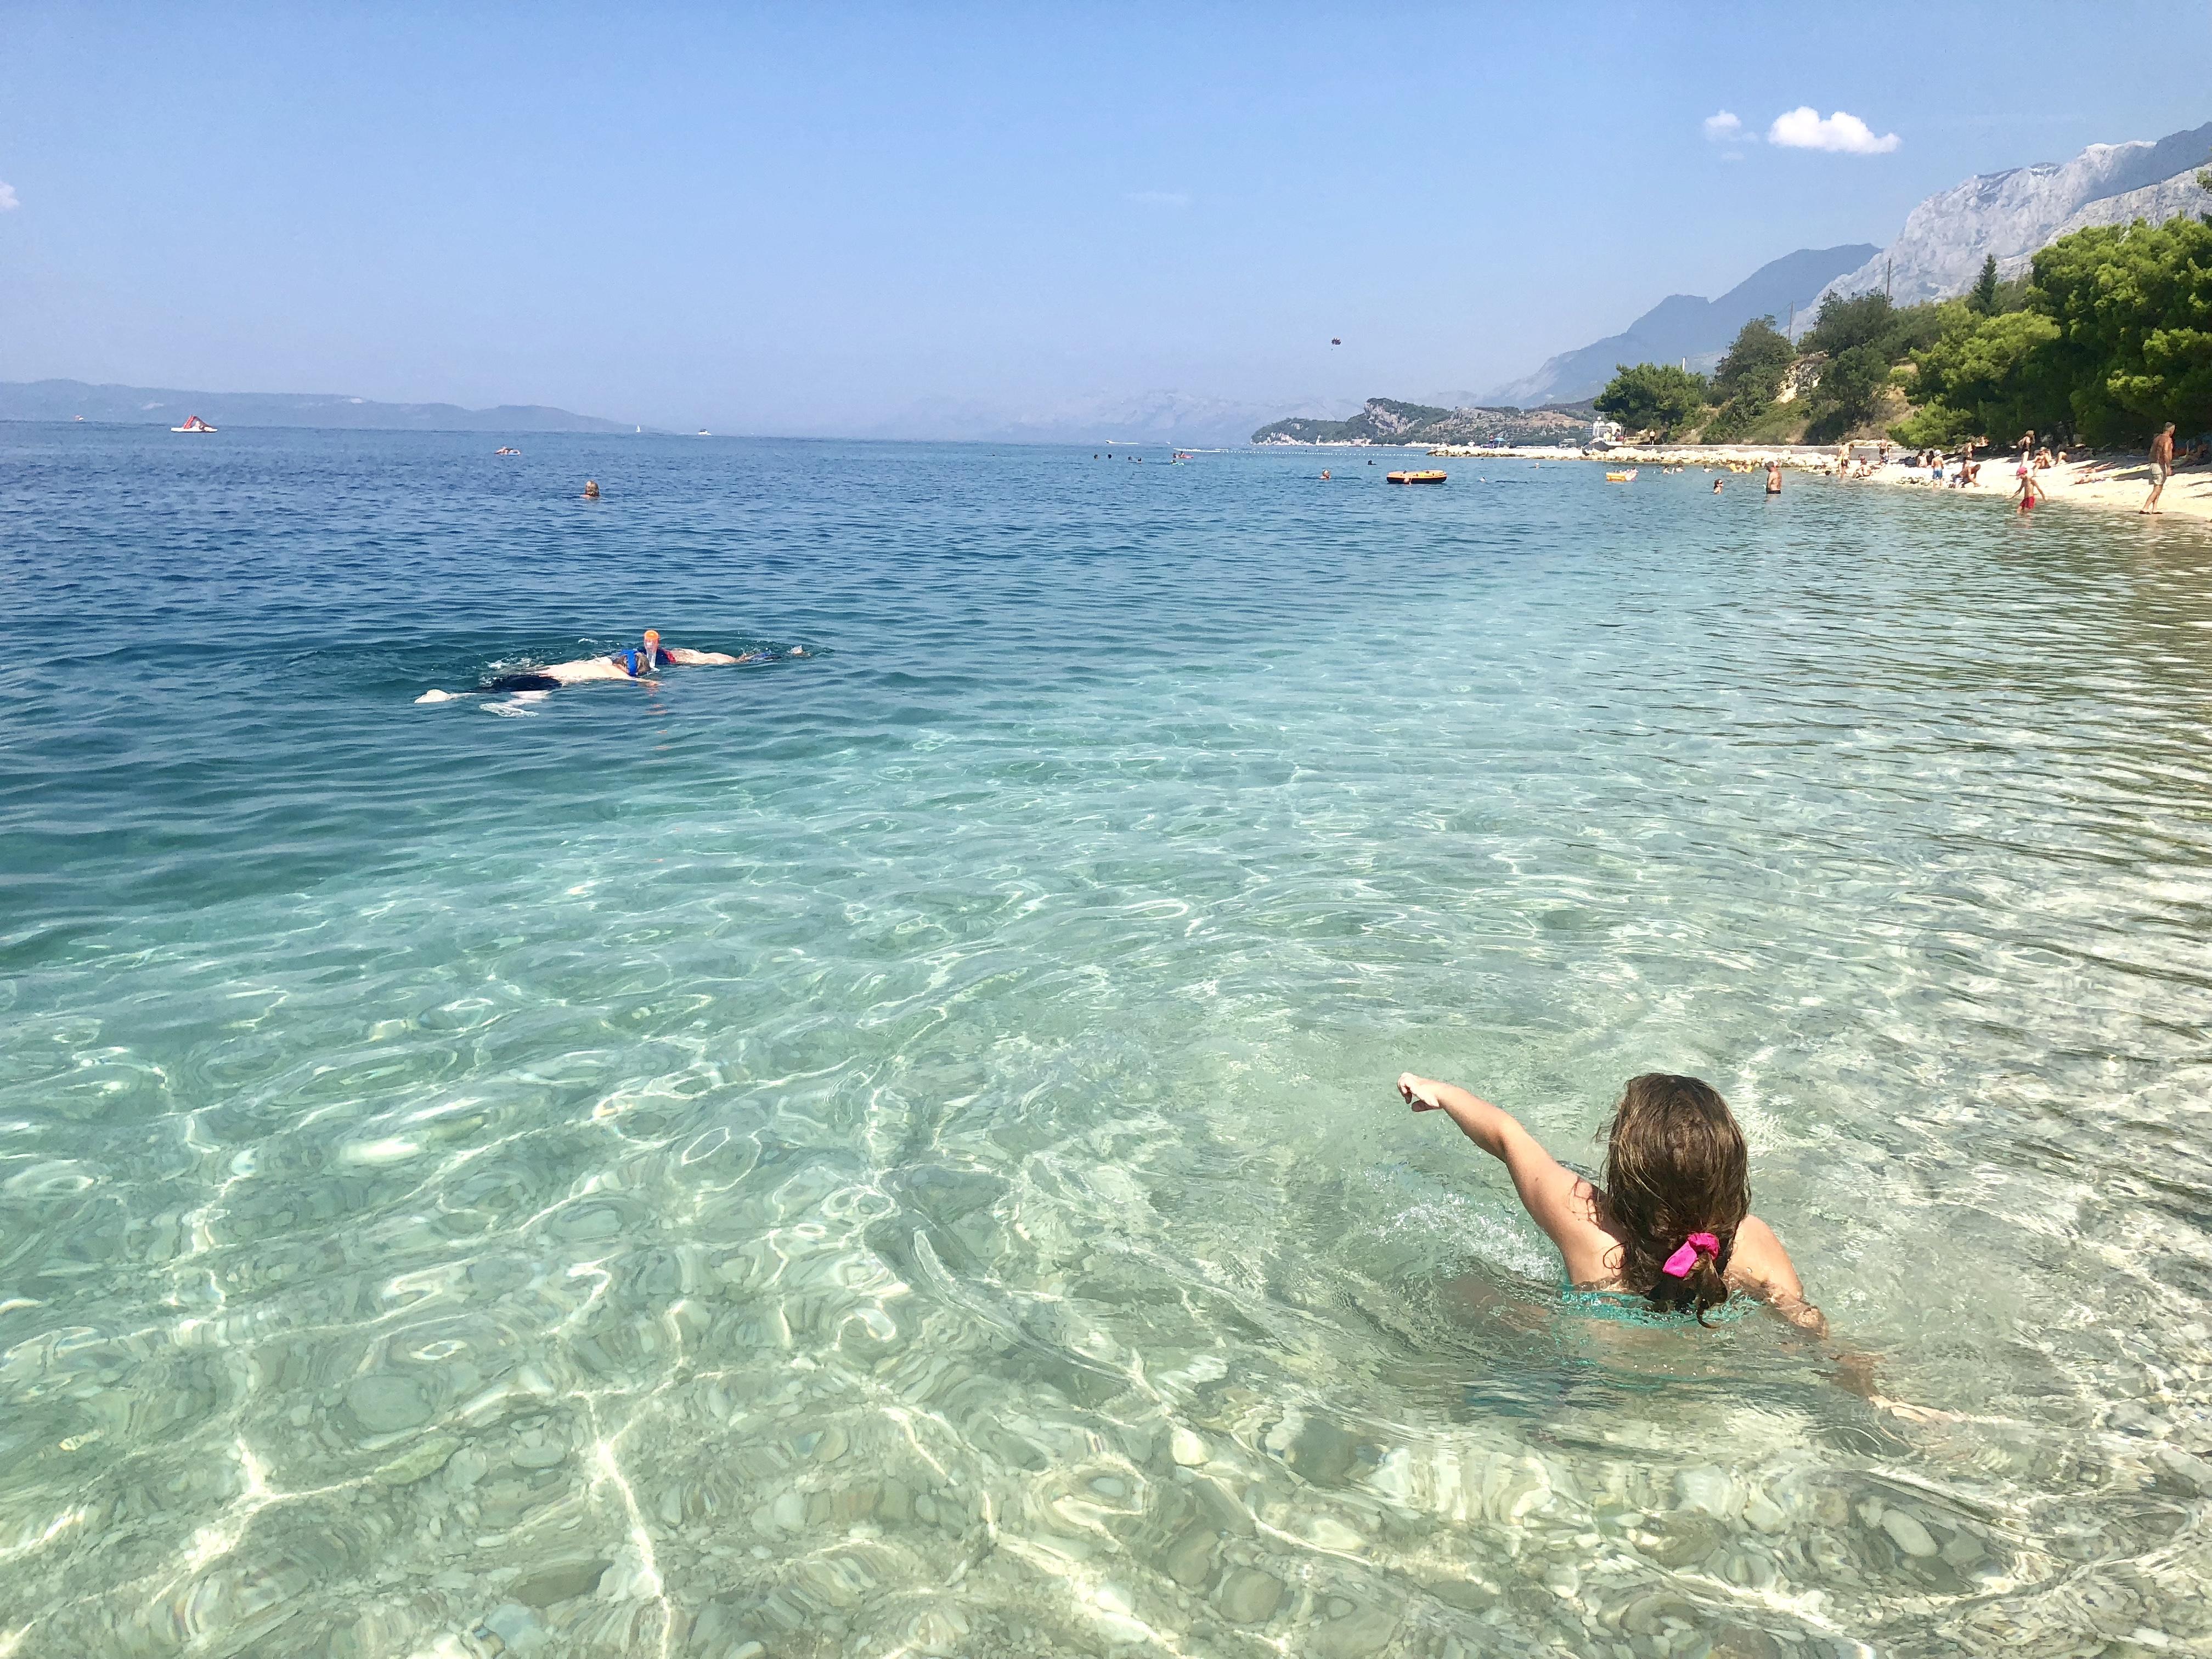 chorwacja, croatia, tucepi, plaża